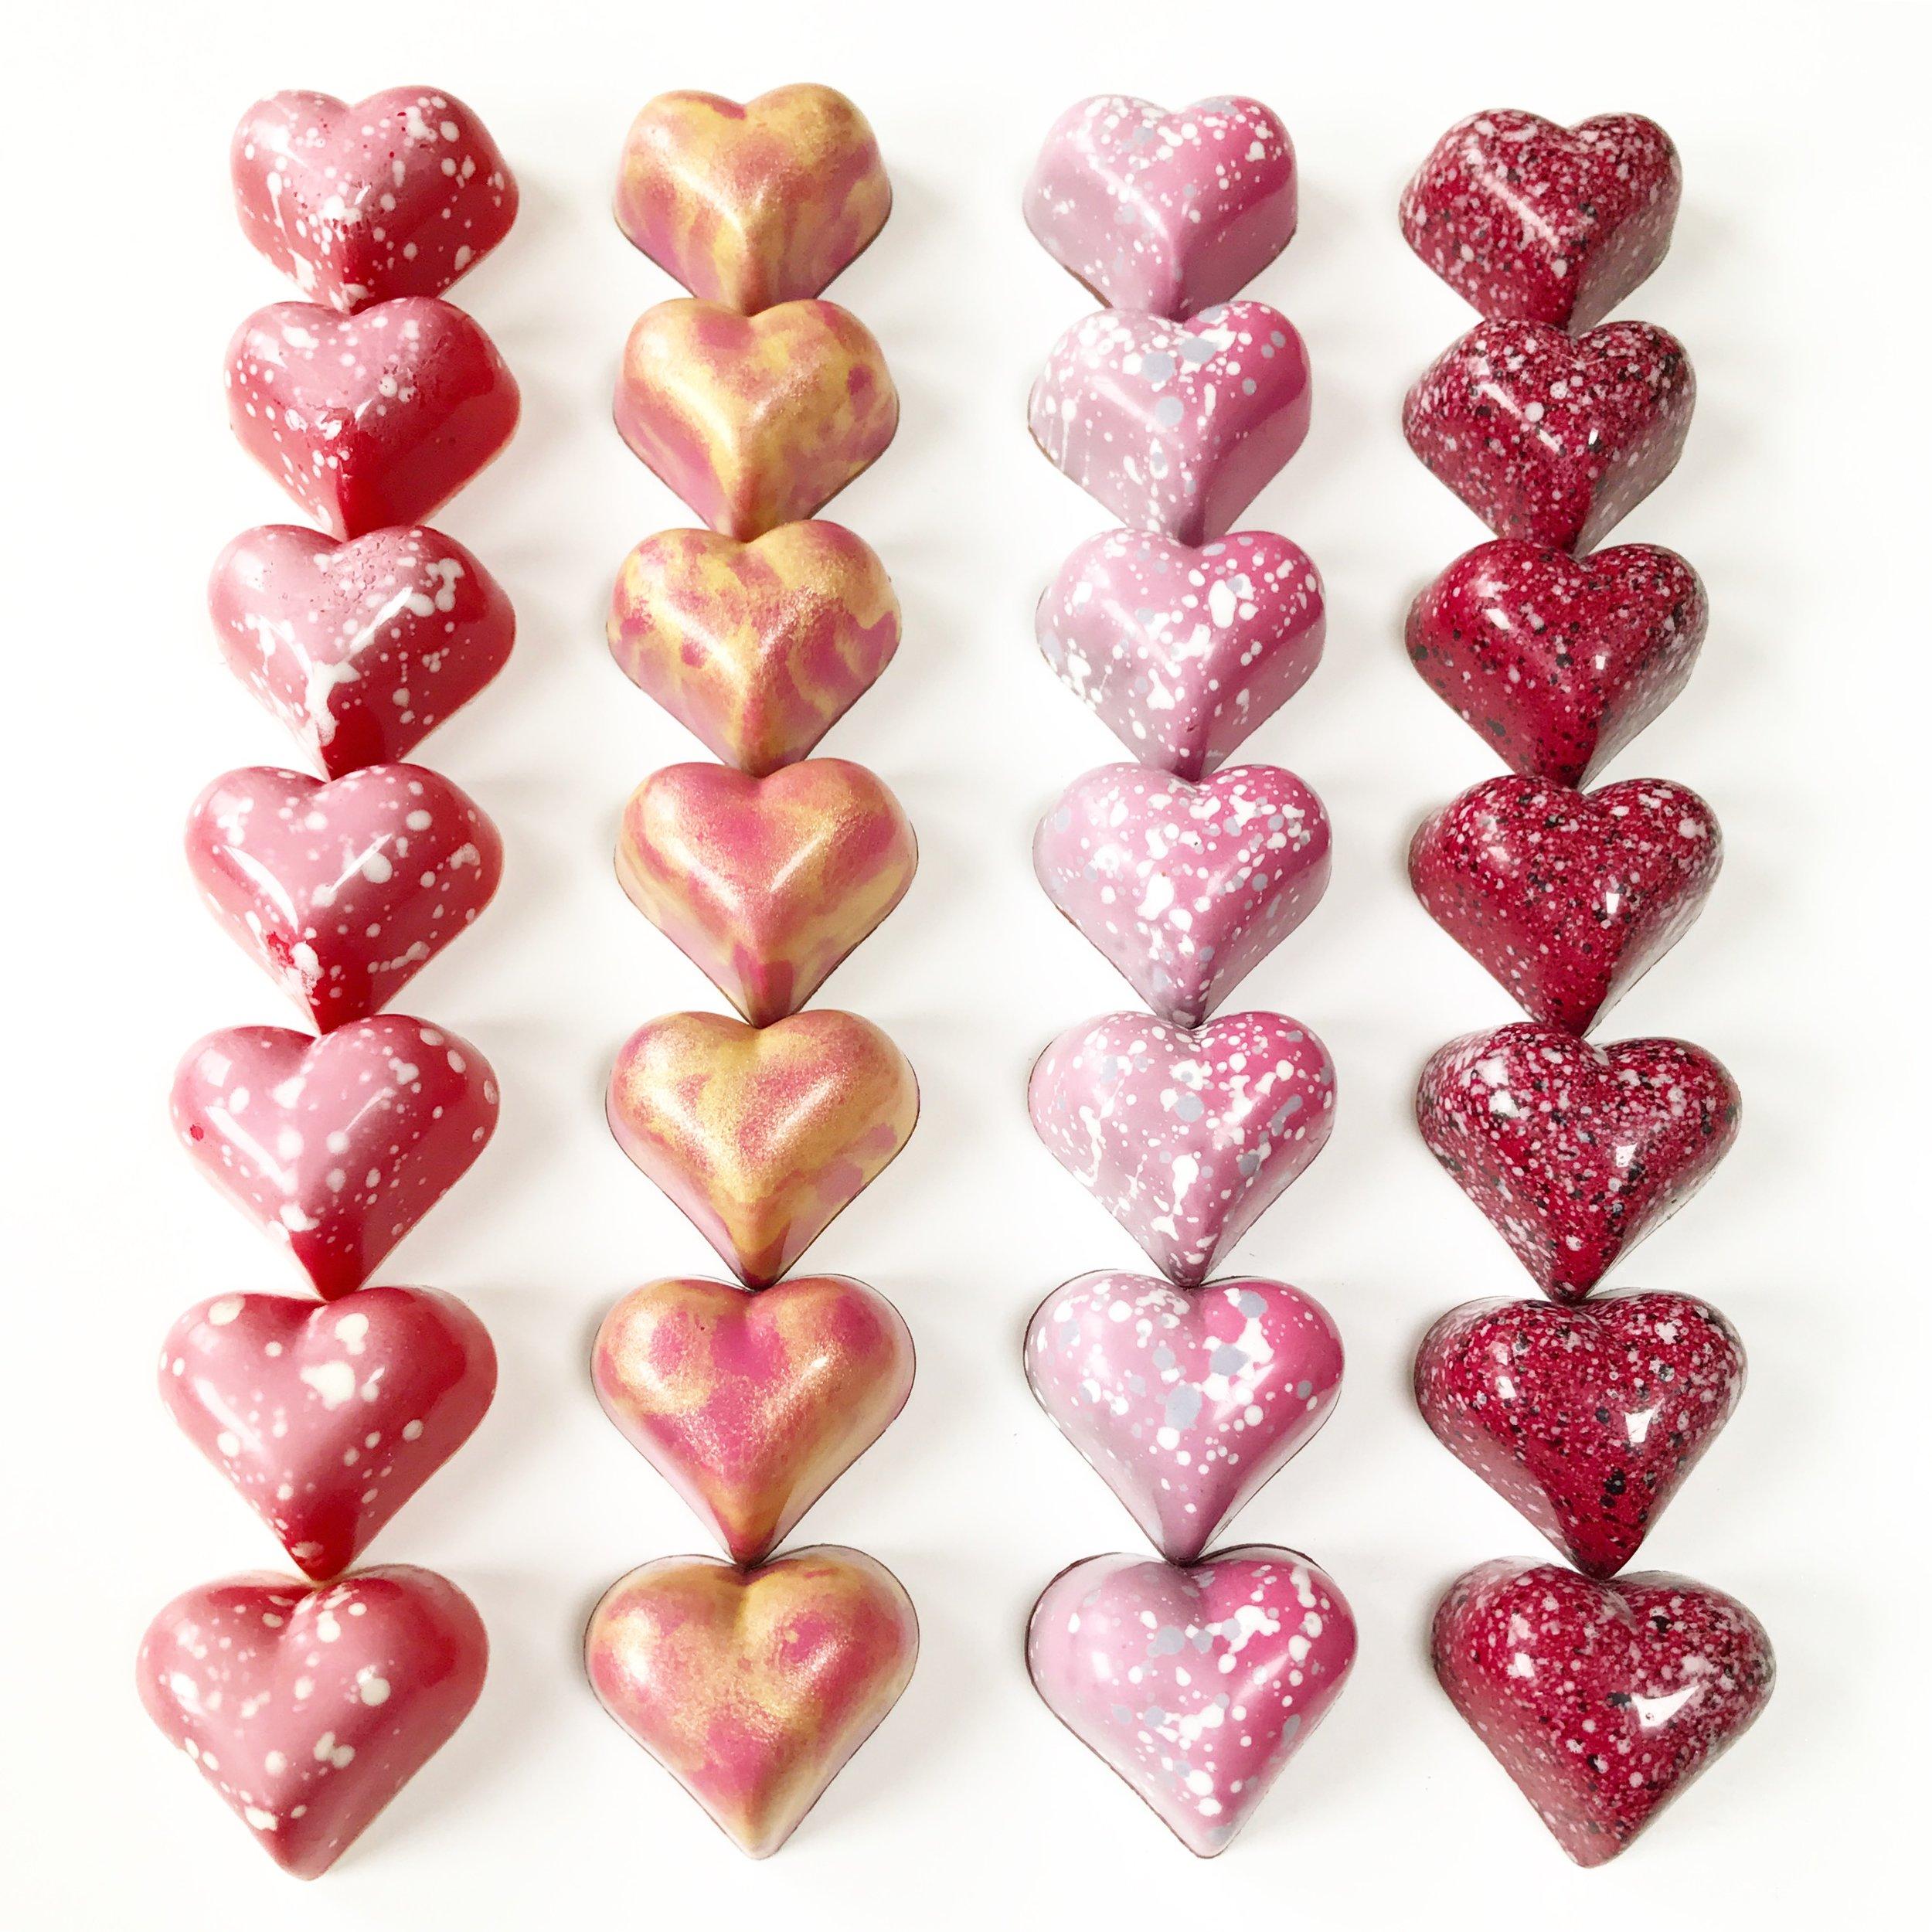 Valentine's Heart Shaped Chocolate Bonbon Collection.JPG